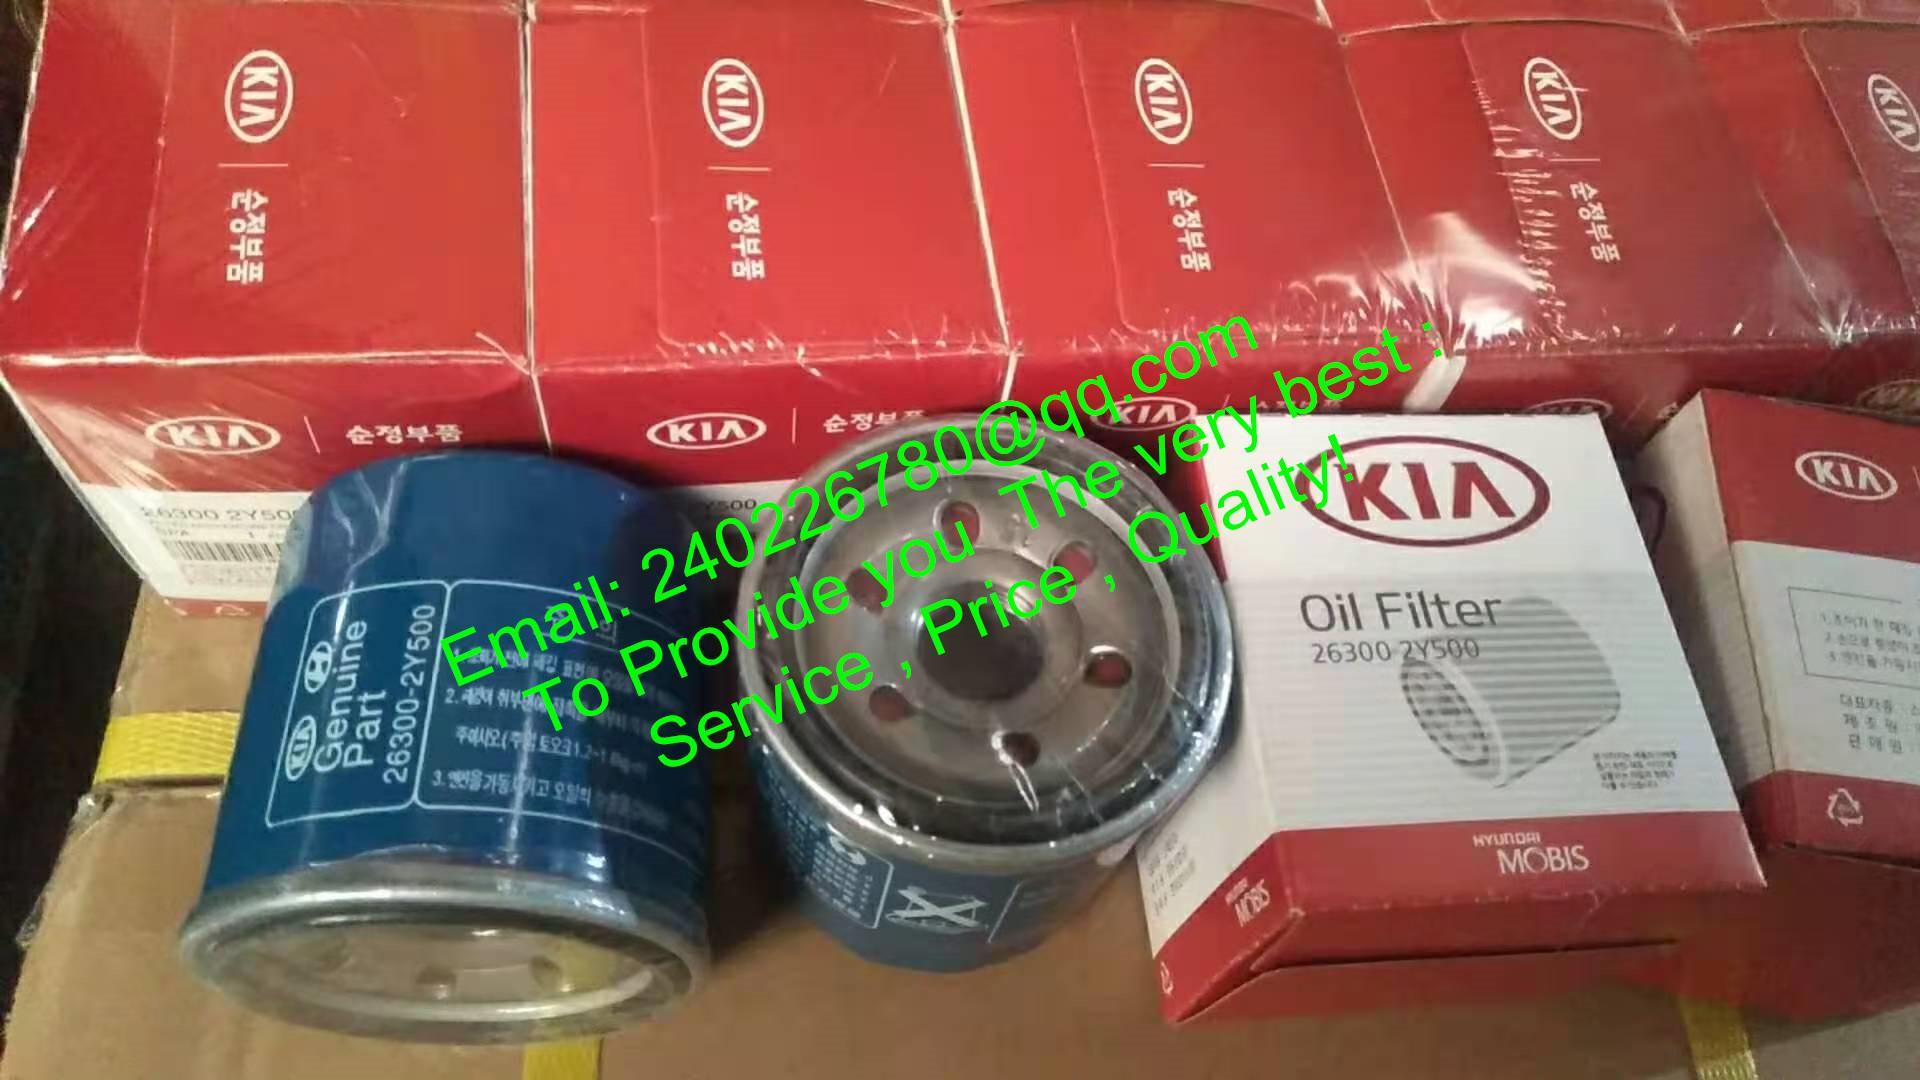 For Hyundai For KIA Oil Filter for Santro 26300-2Y500 263002Y500 26300-02500